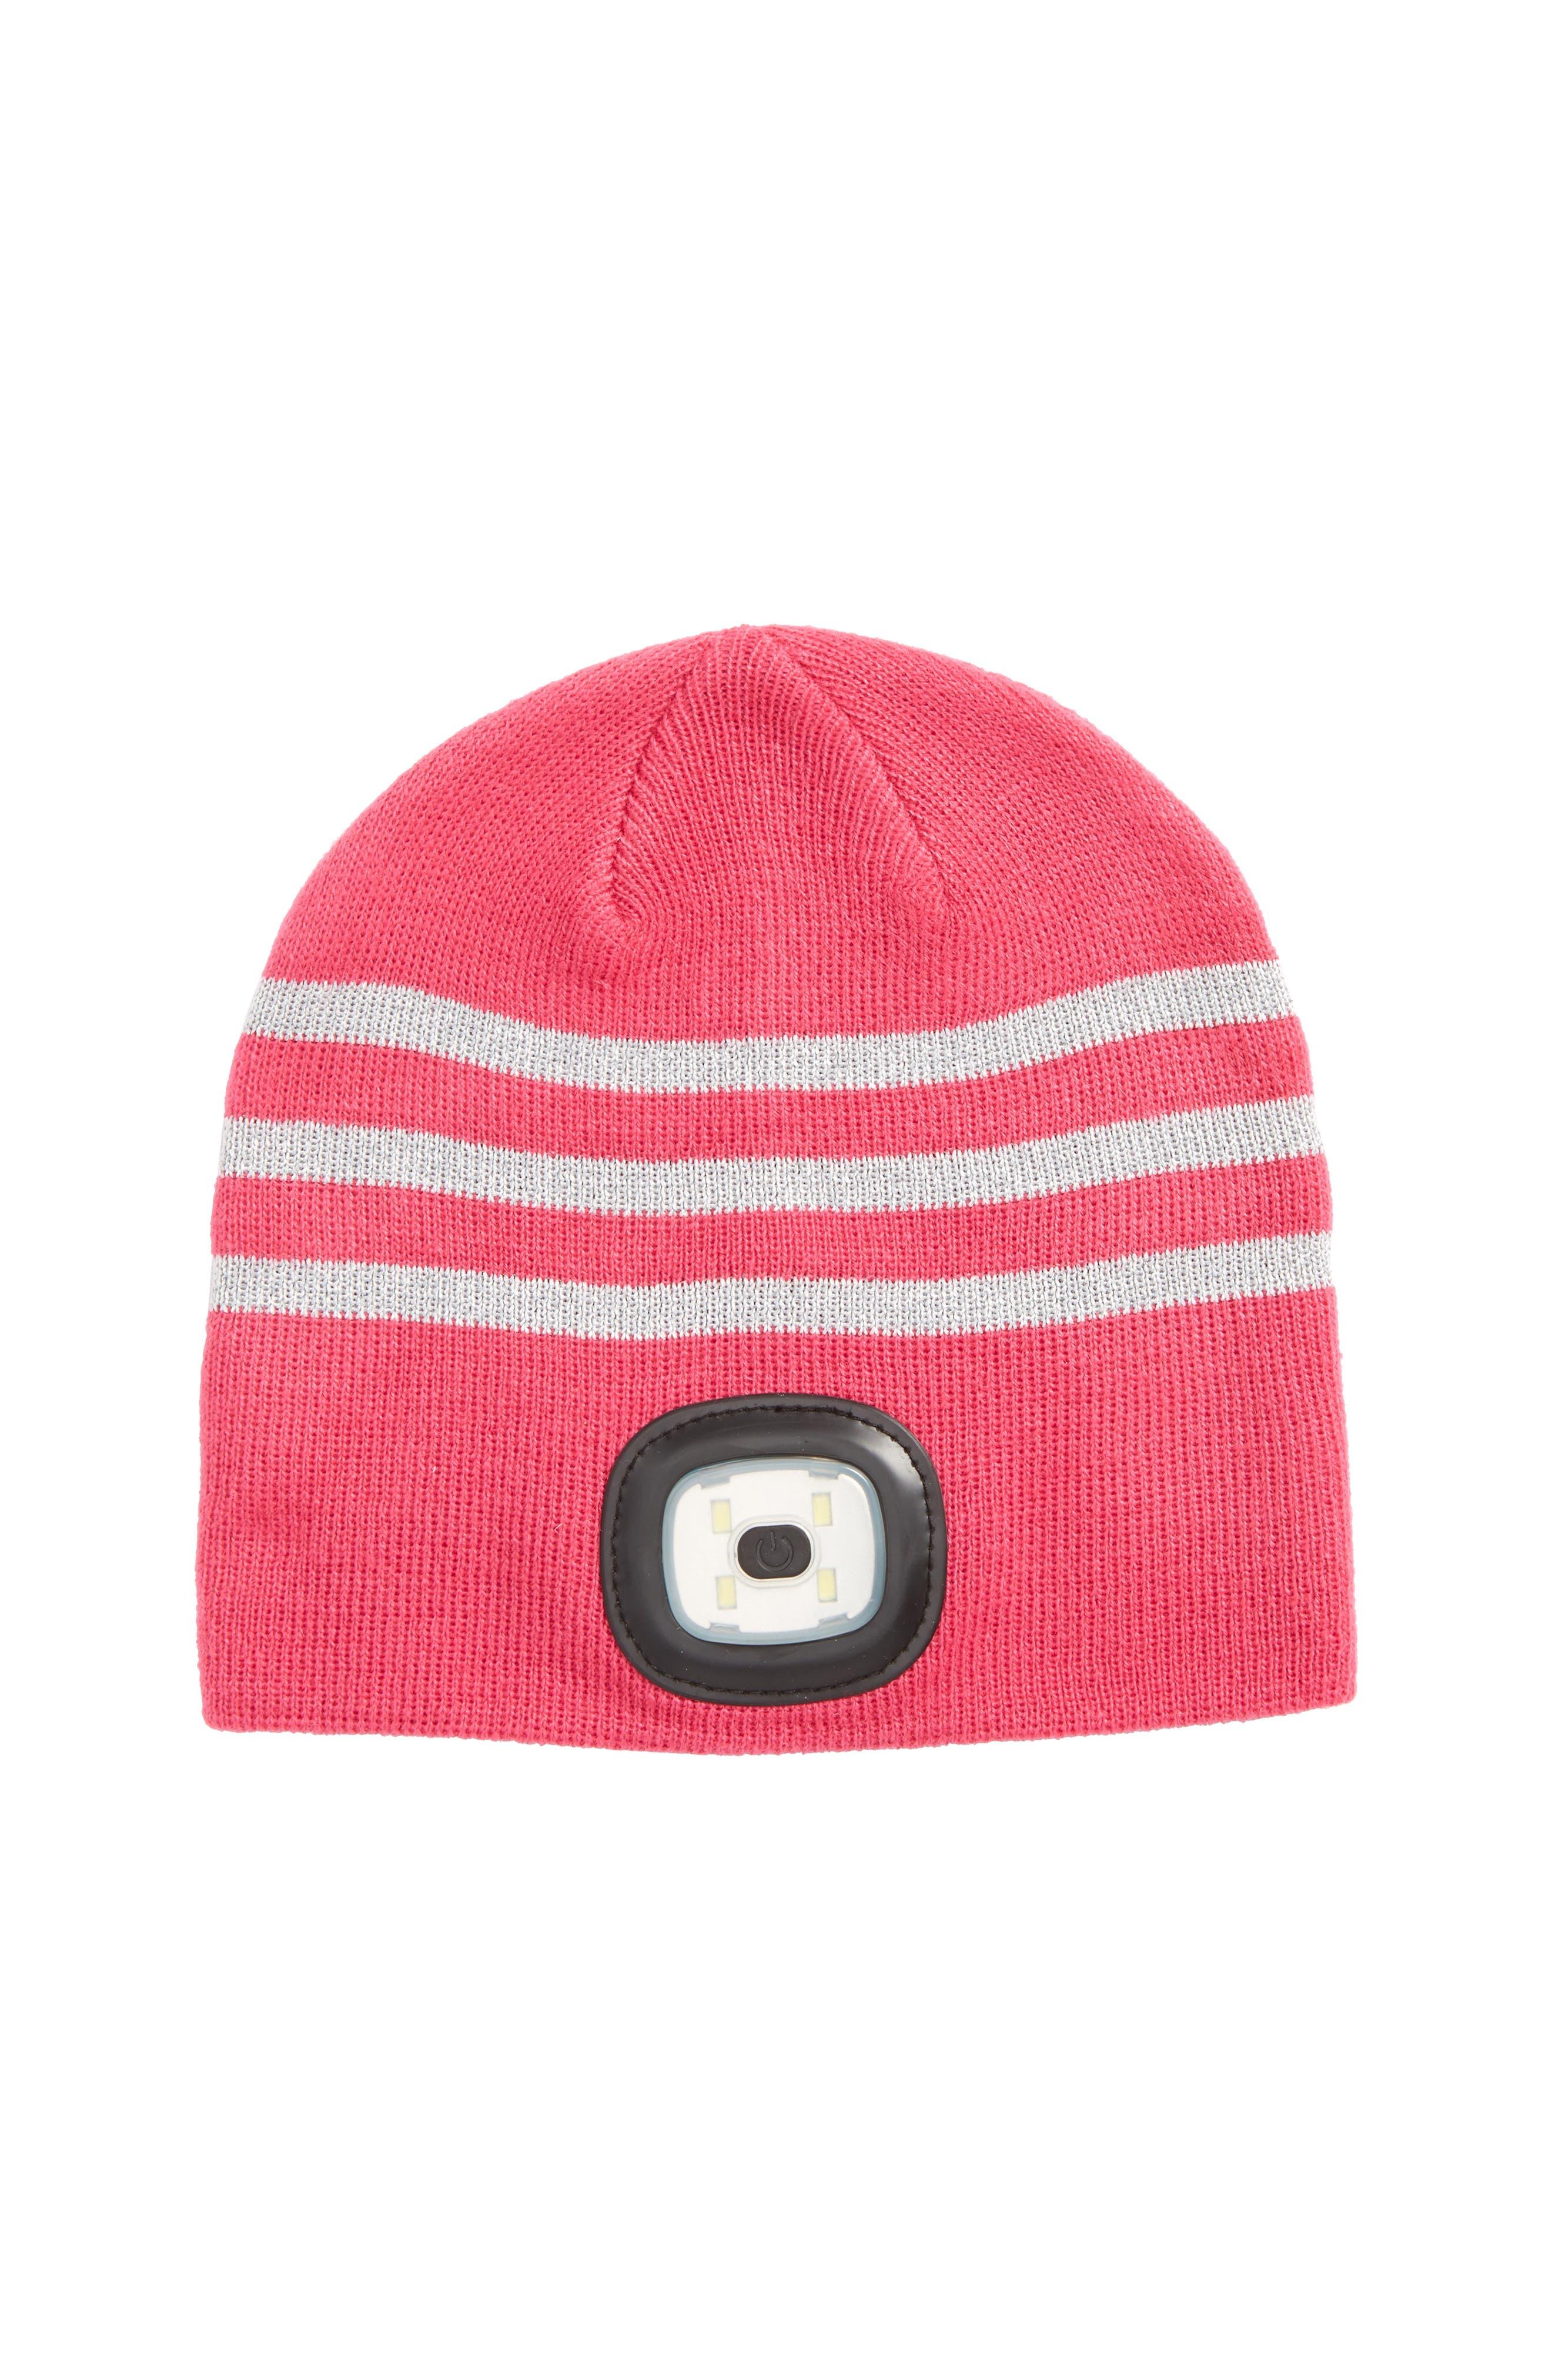 MoMA Design Store Kids X-Cap Light Up Hat